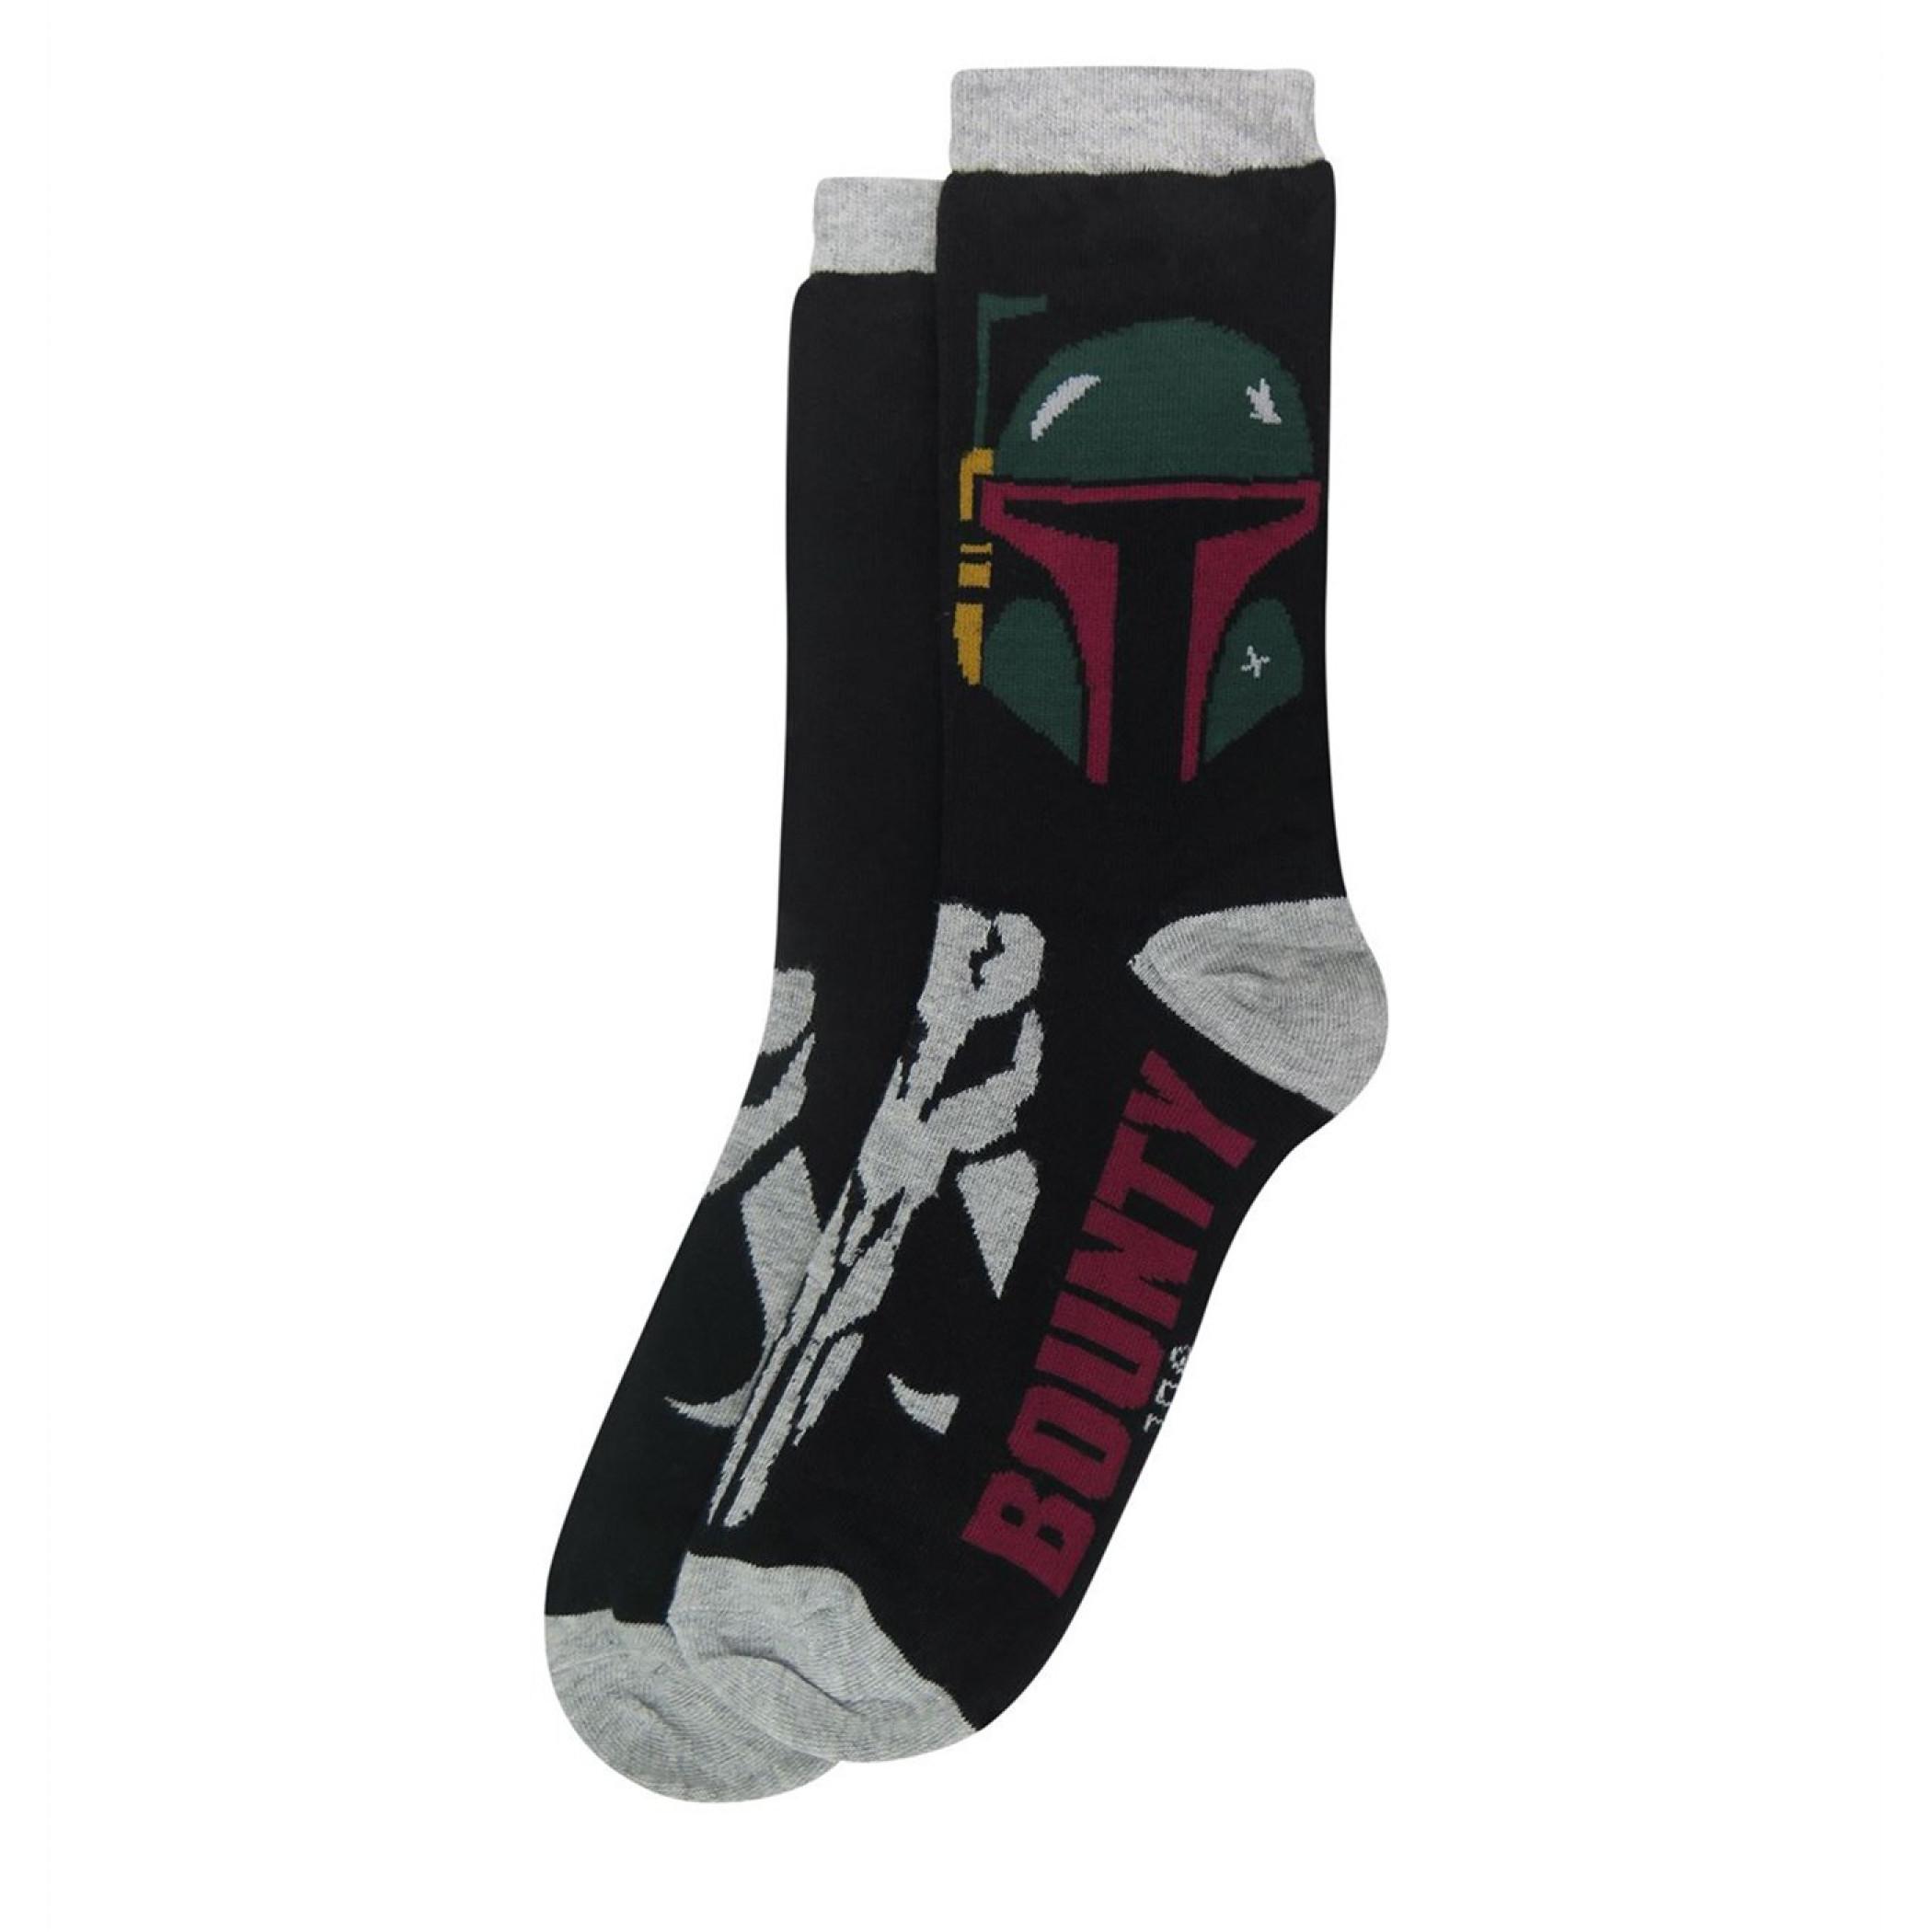 Star Wars Villains Symbols Crew Socks 2-Pair Pack